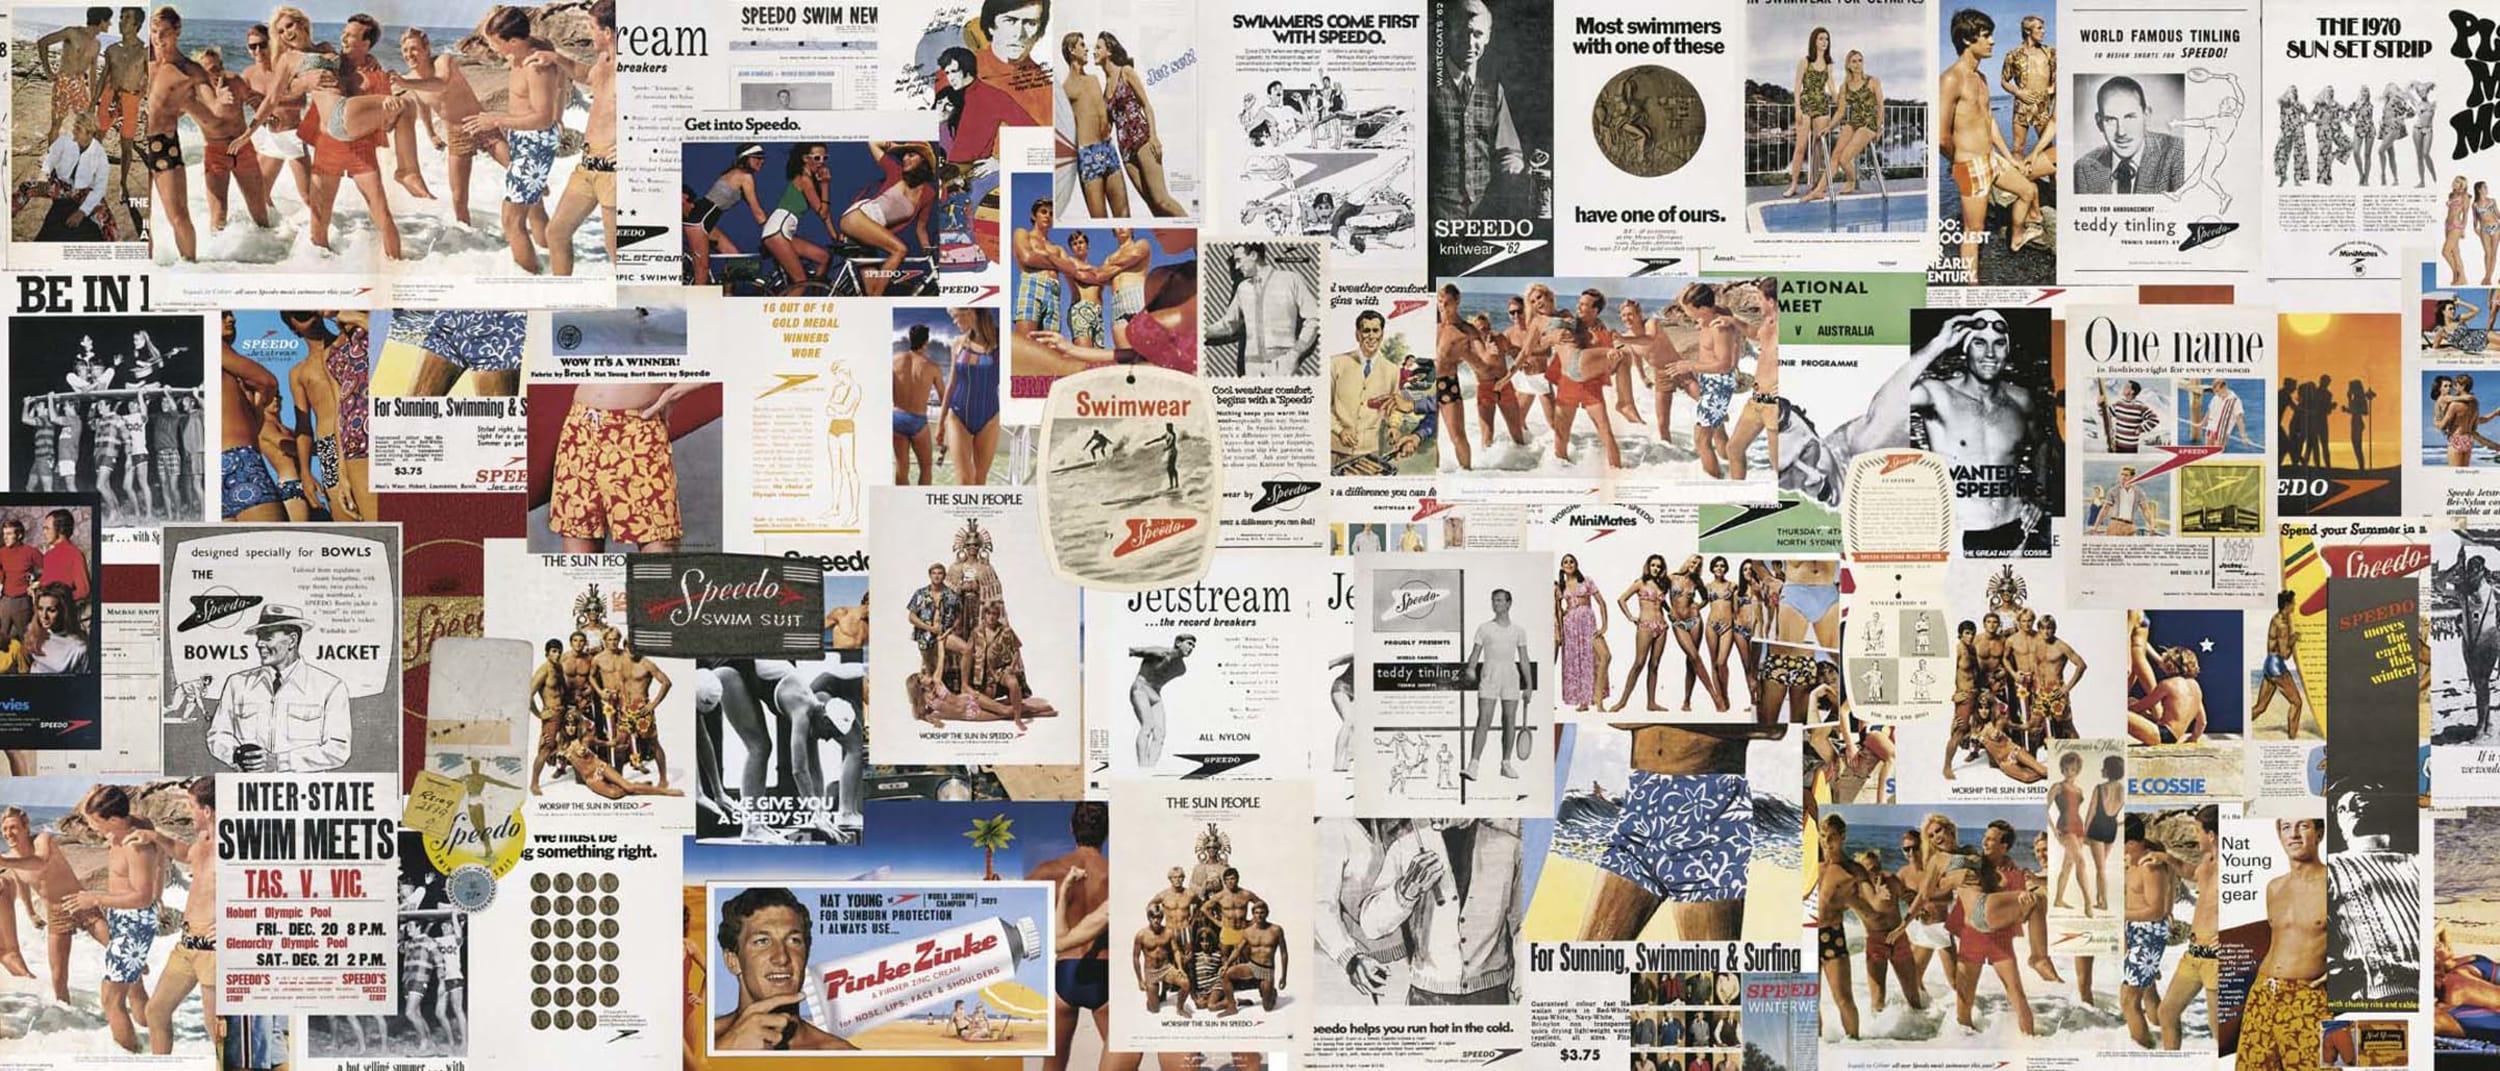 Speedo's 90th Anniversary Exhibition